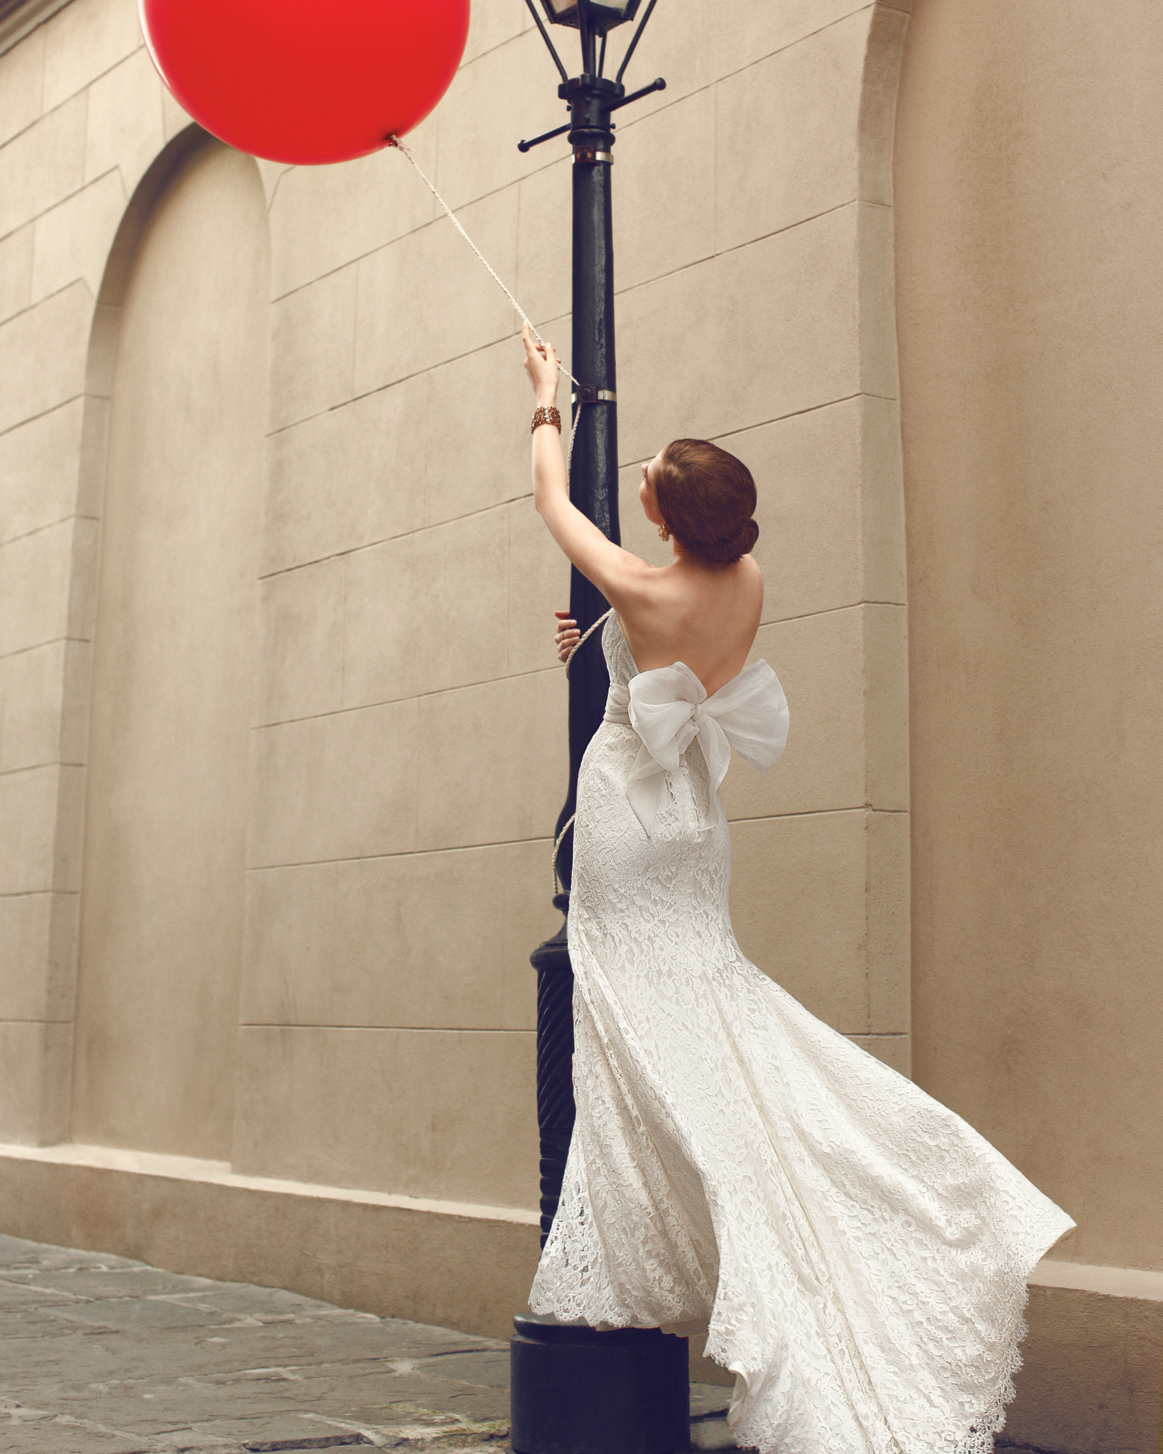 wedding-dress-12-mwd108453.jpg